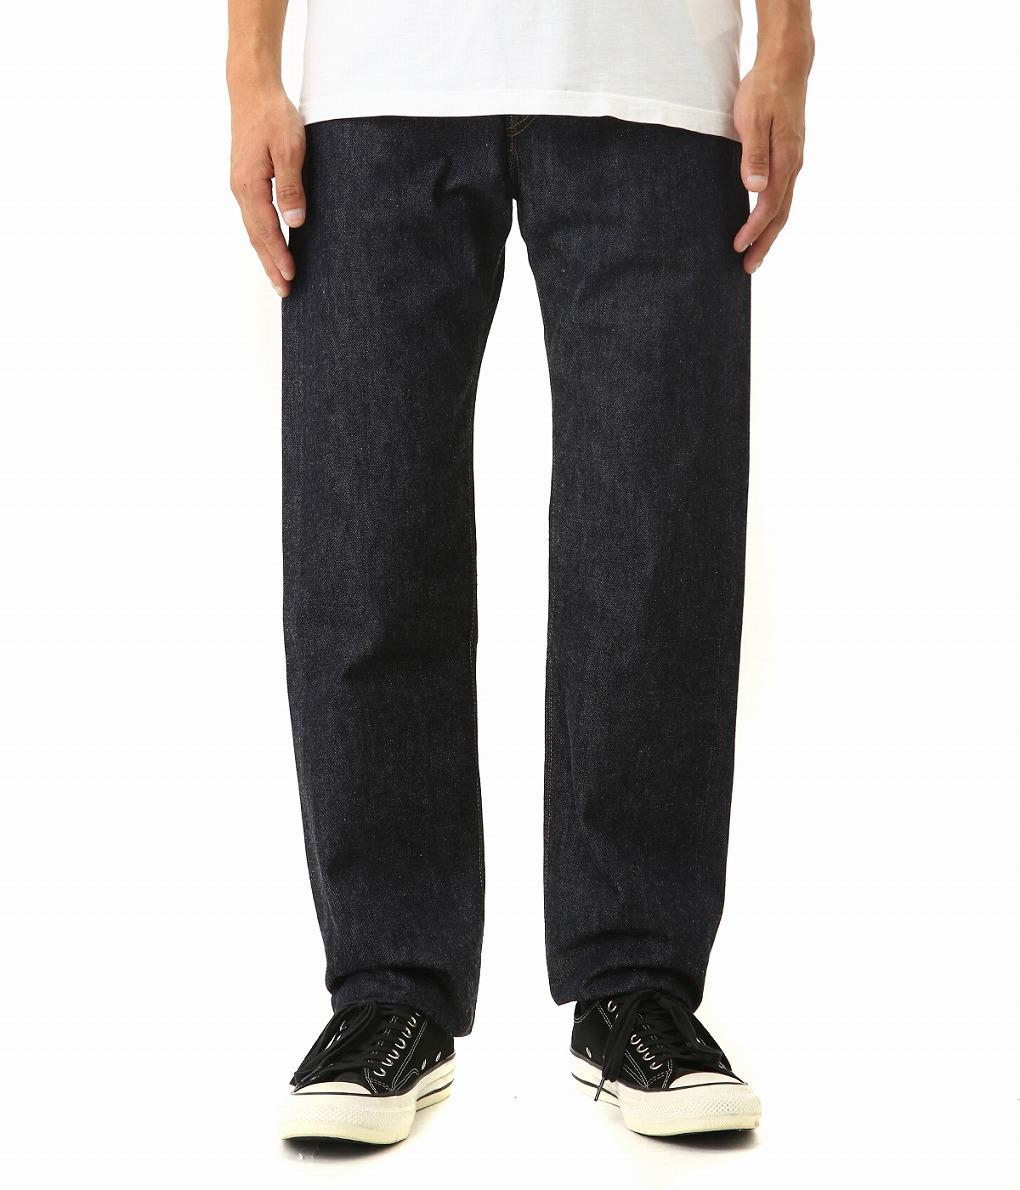 LEVIS VINTAGE CLOTHING / リーバイス ヴィンテージ クロージング : 1954 501 Jeans(レングス34inch) : デニム ボトムス ジーパン ズボン 501 リーバイス : 50154-0068-L34 【AST】